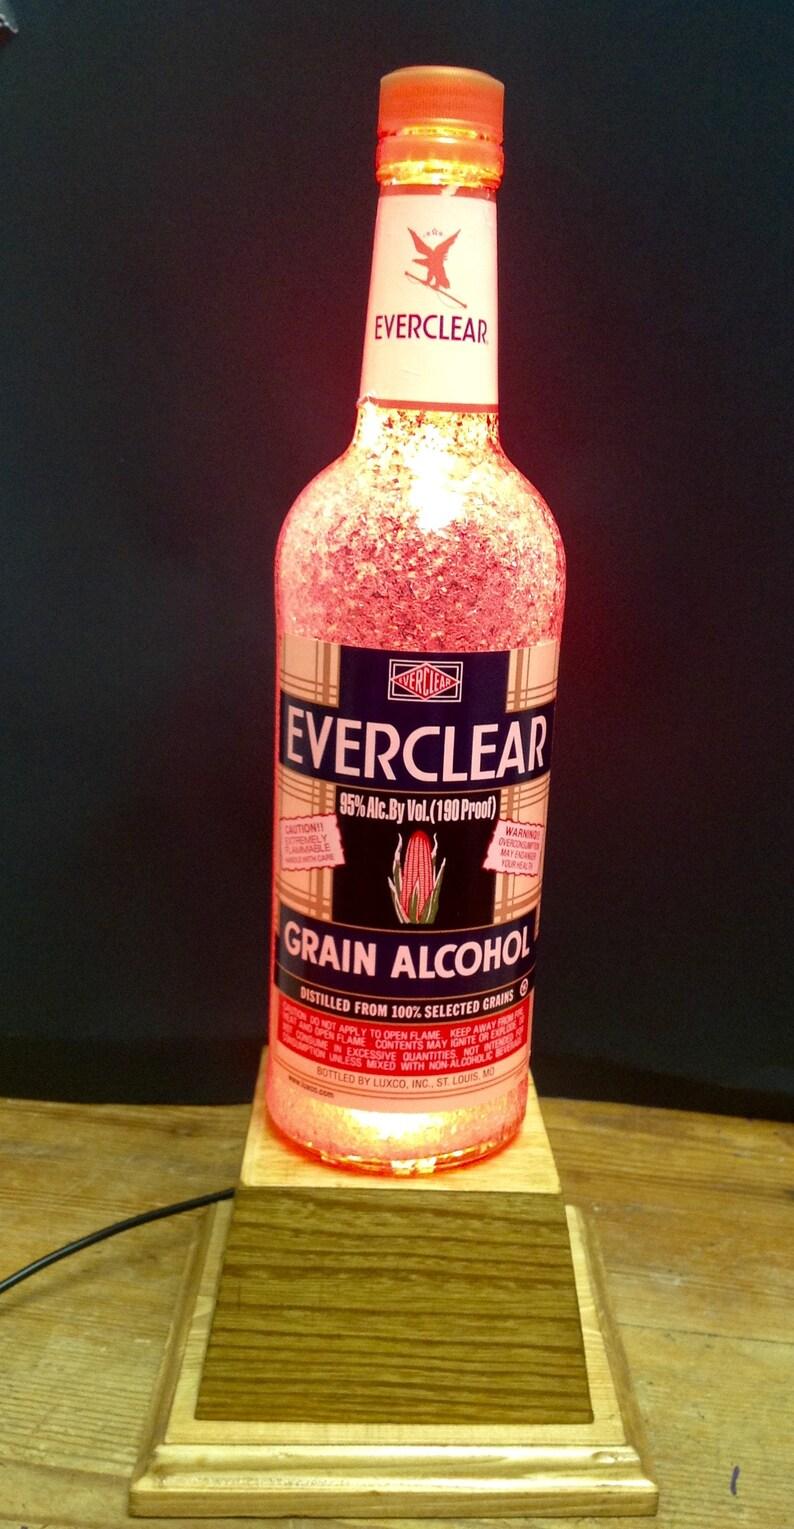 Everclear 190 proof georgia